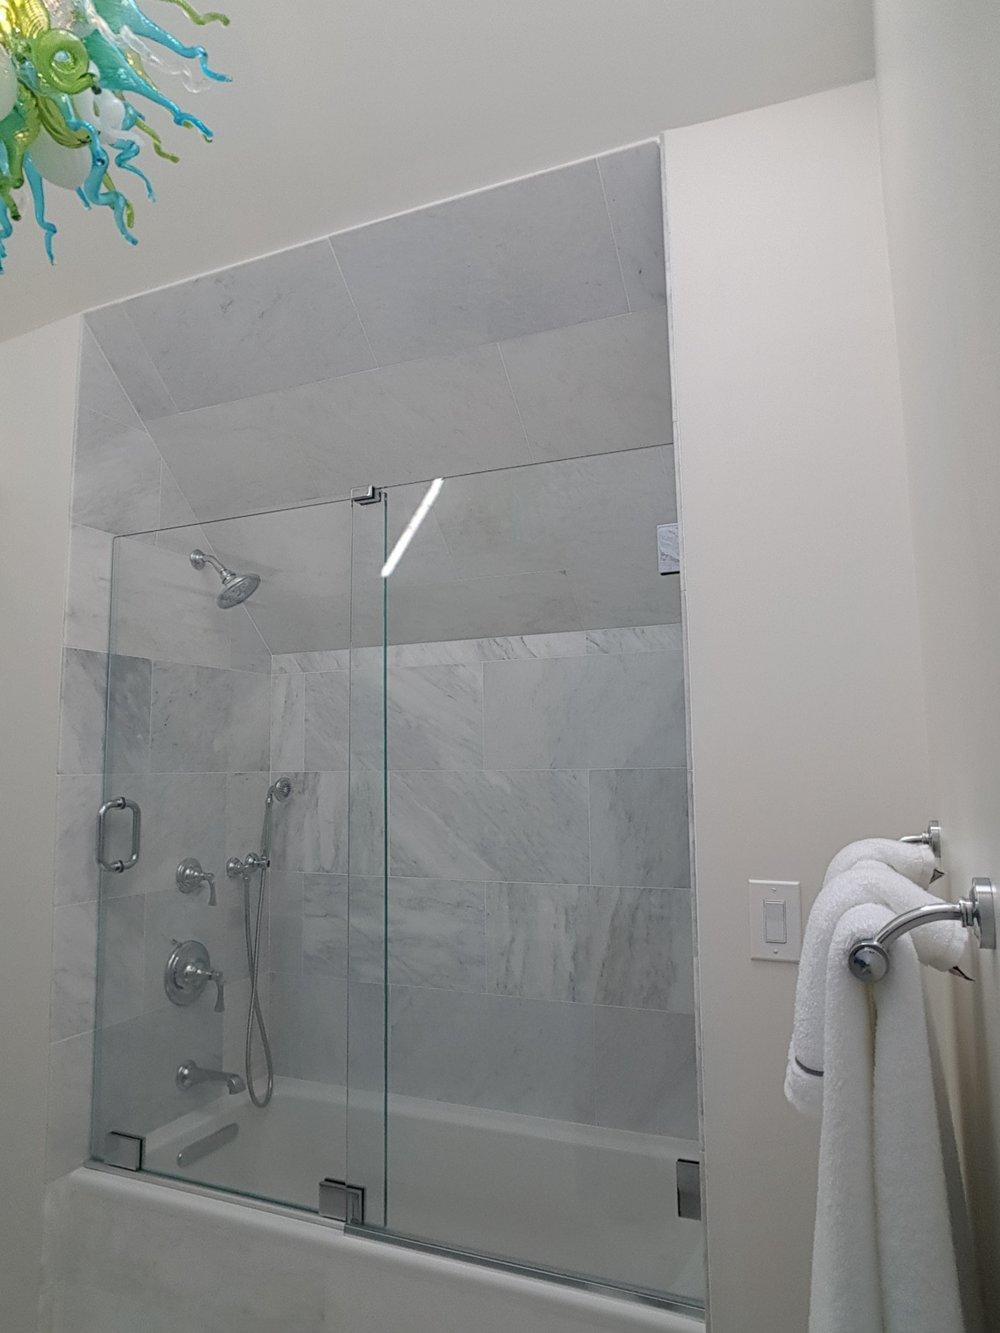 Headerless glass sliding shower door and panel